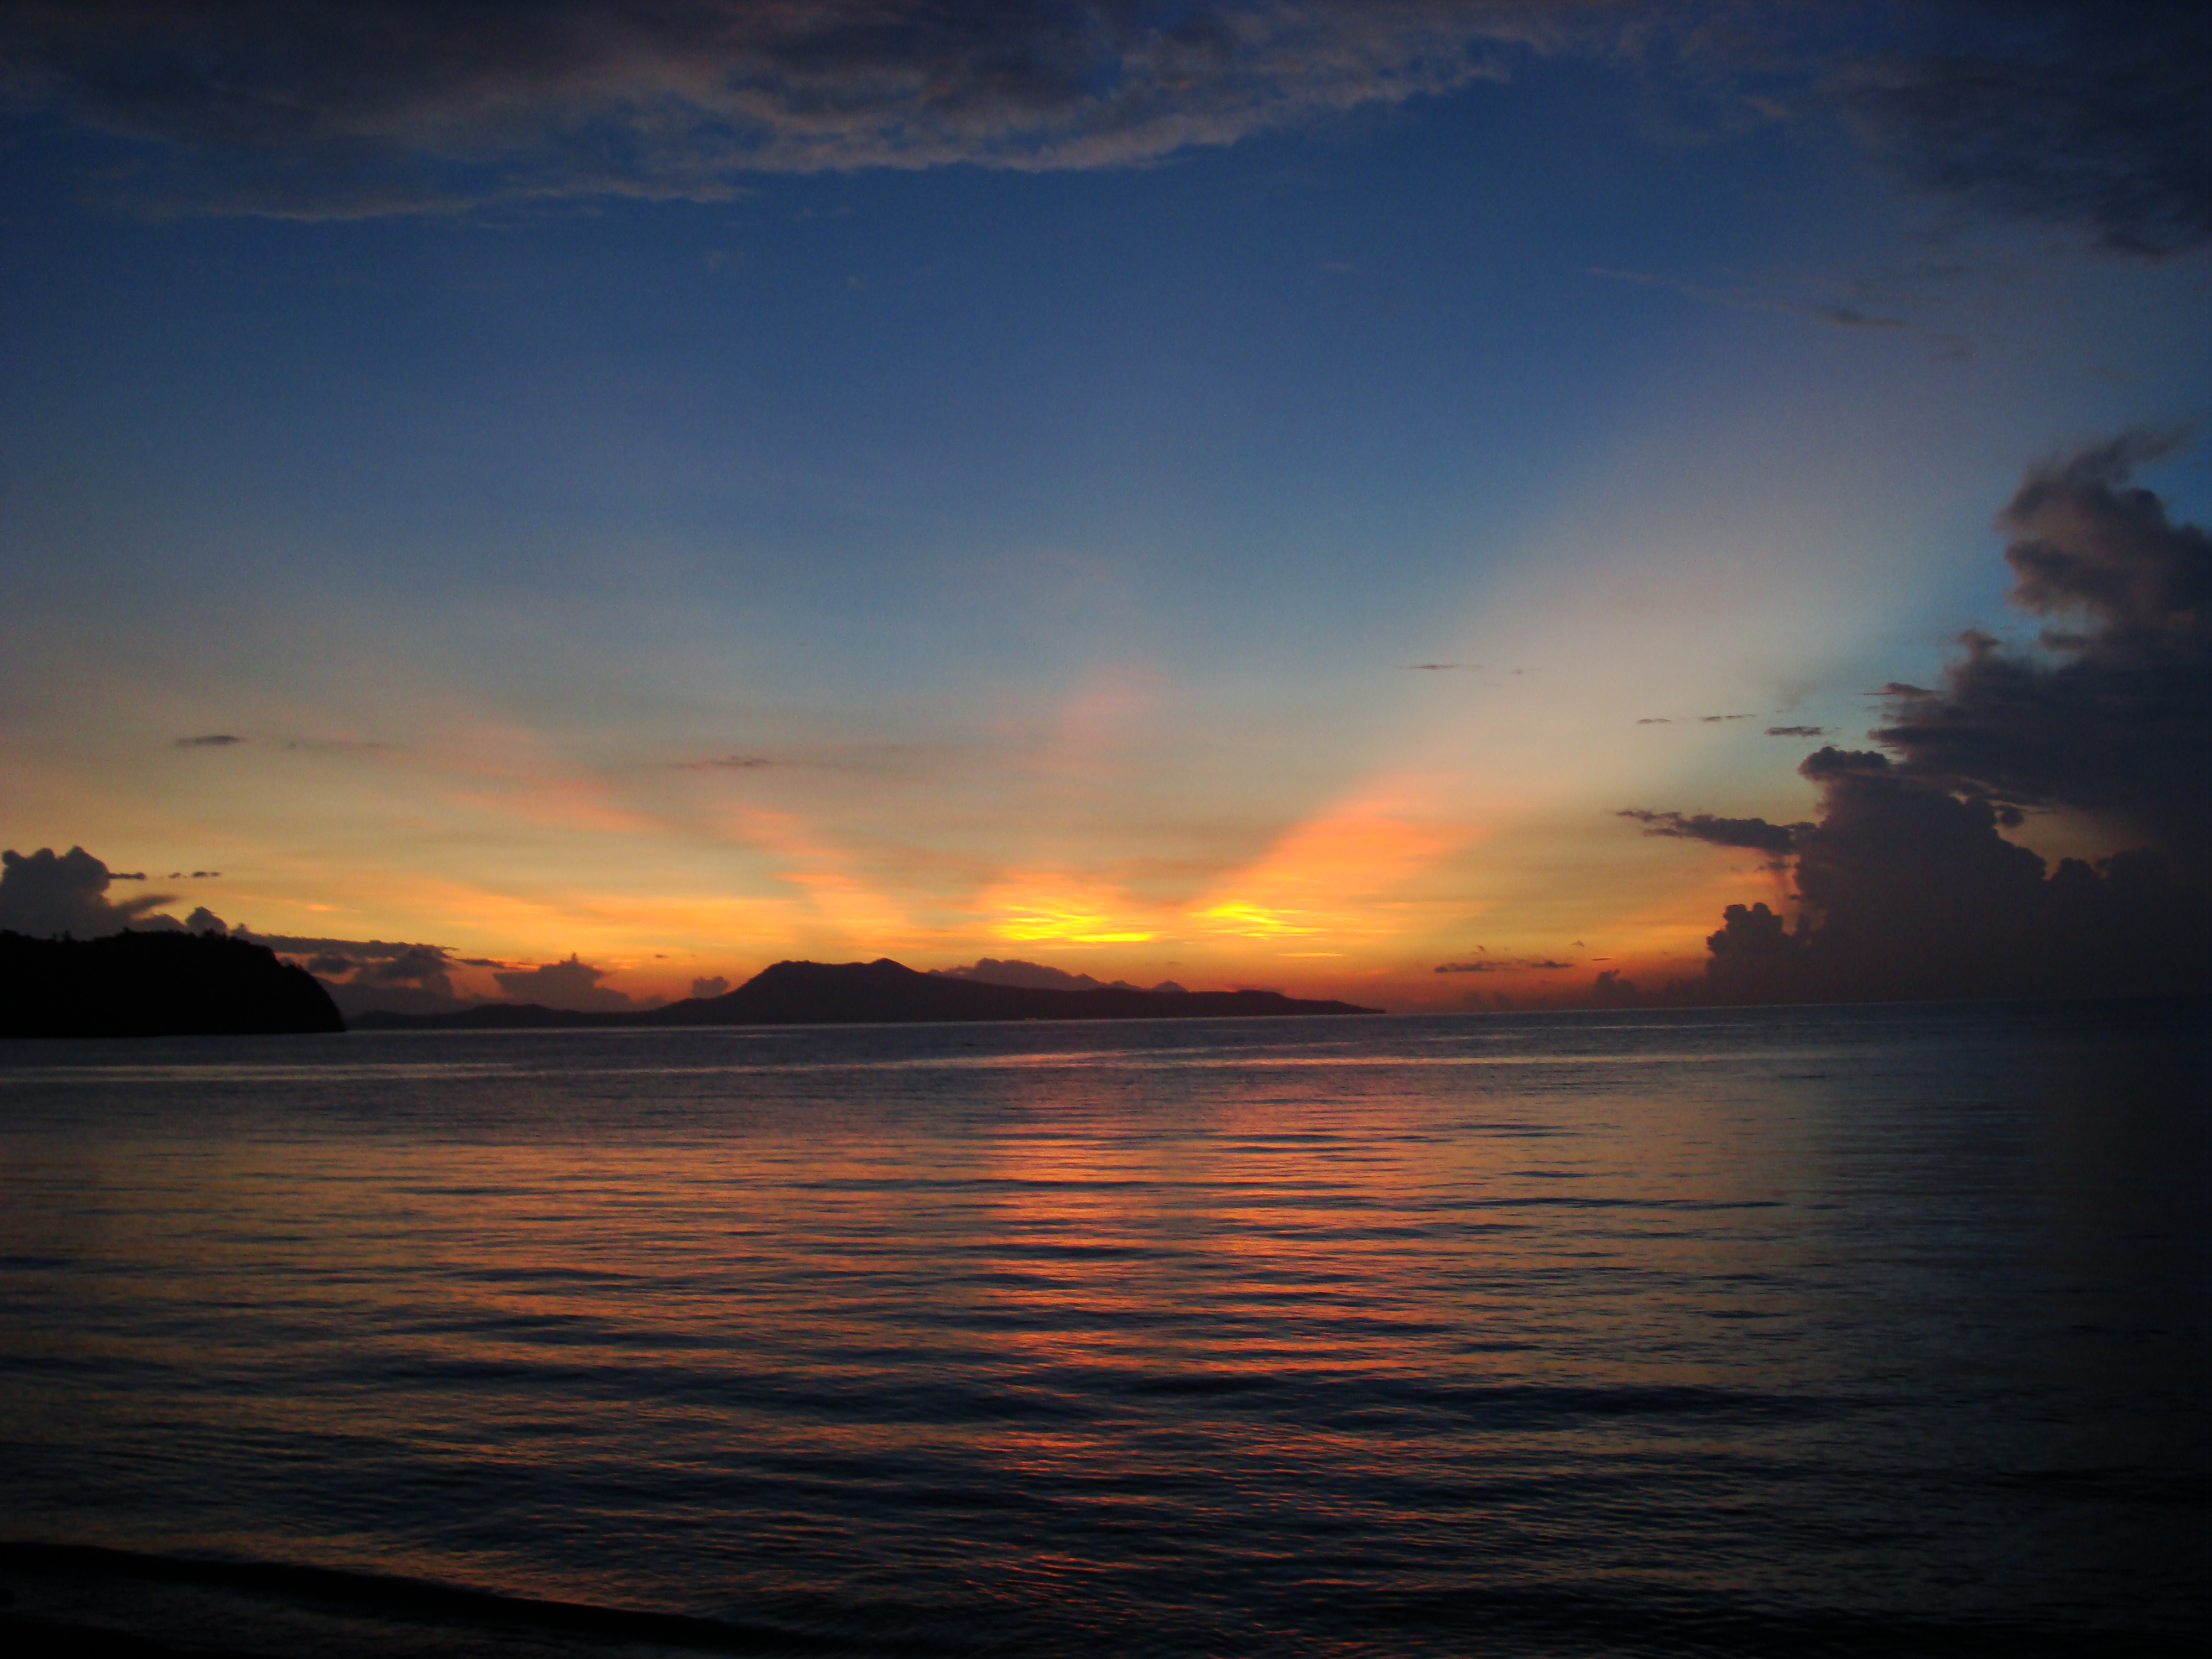 Sunrise Philippines Mindoro Island Tabinay 42